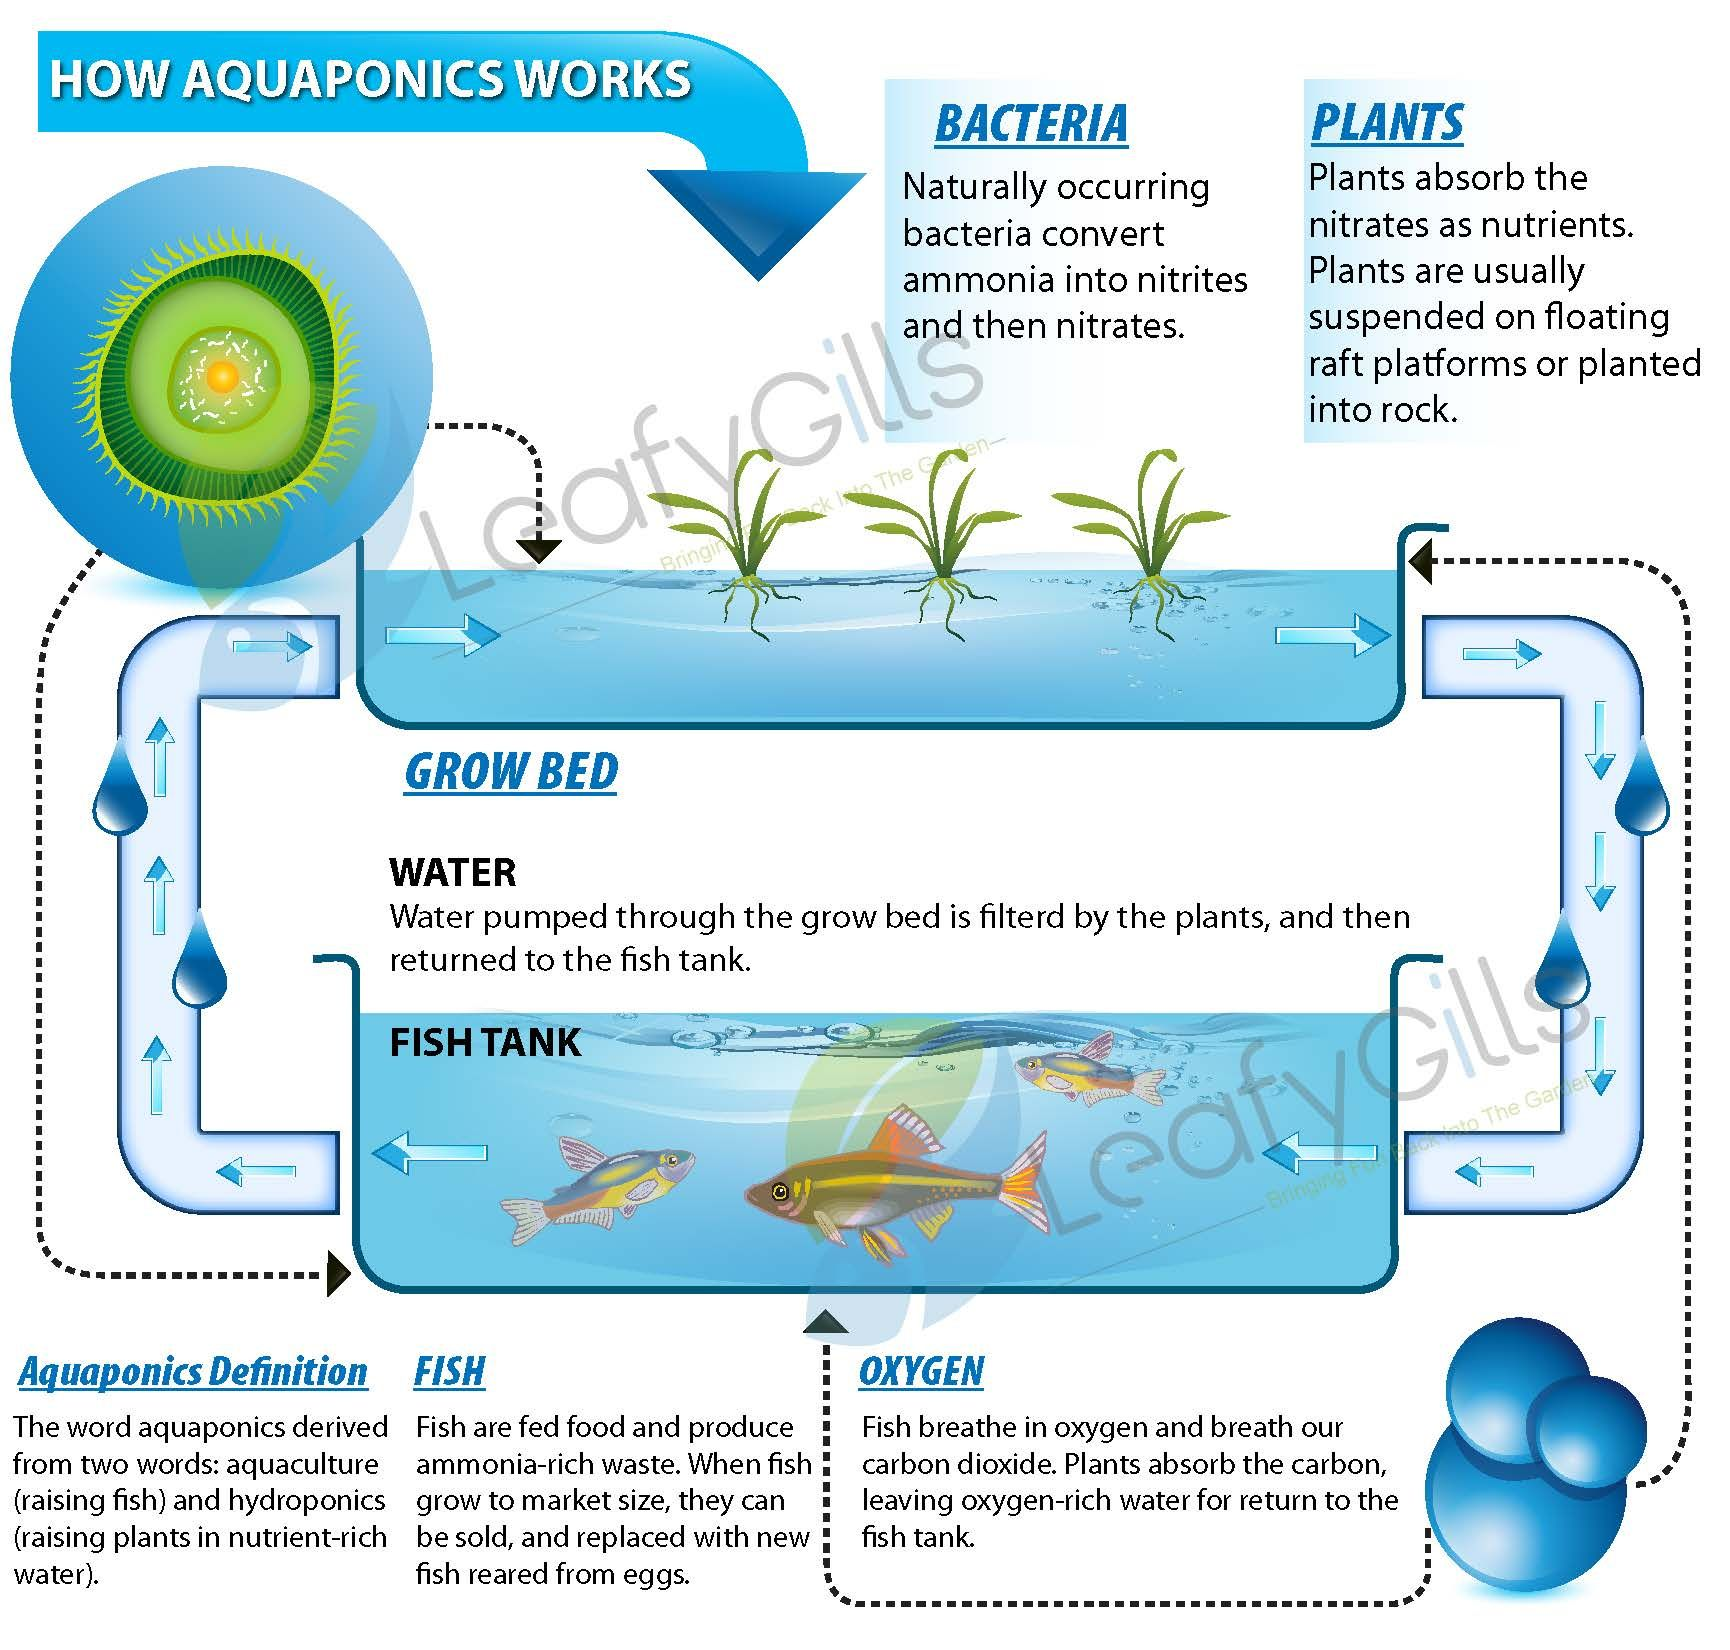 medium resolution of aquaponics system the benefits of aquaponics include